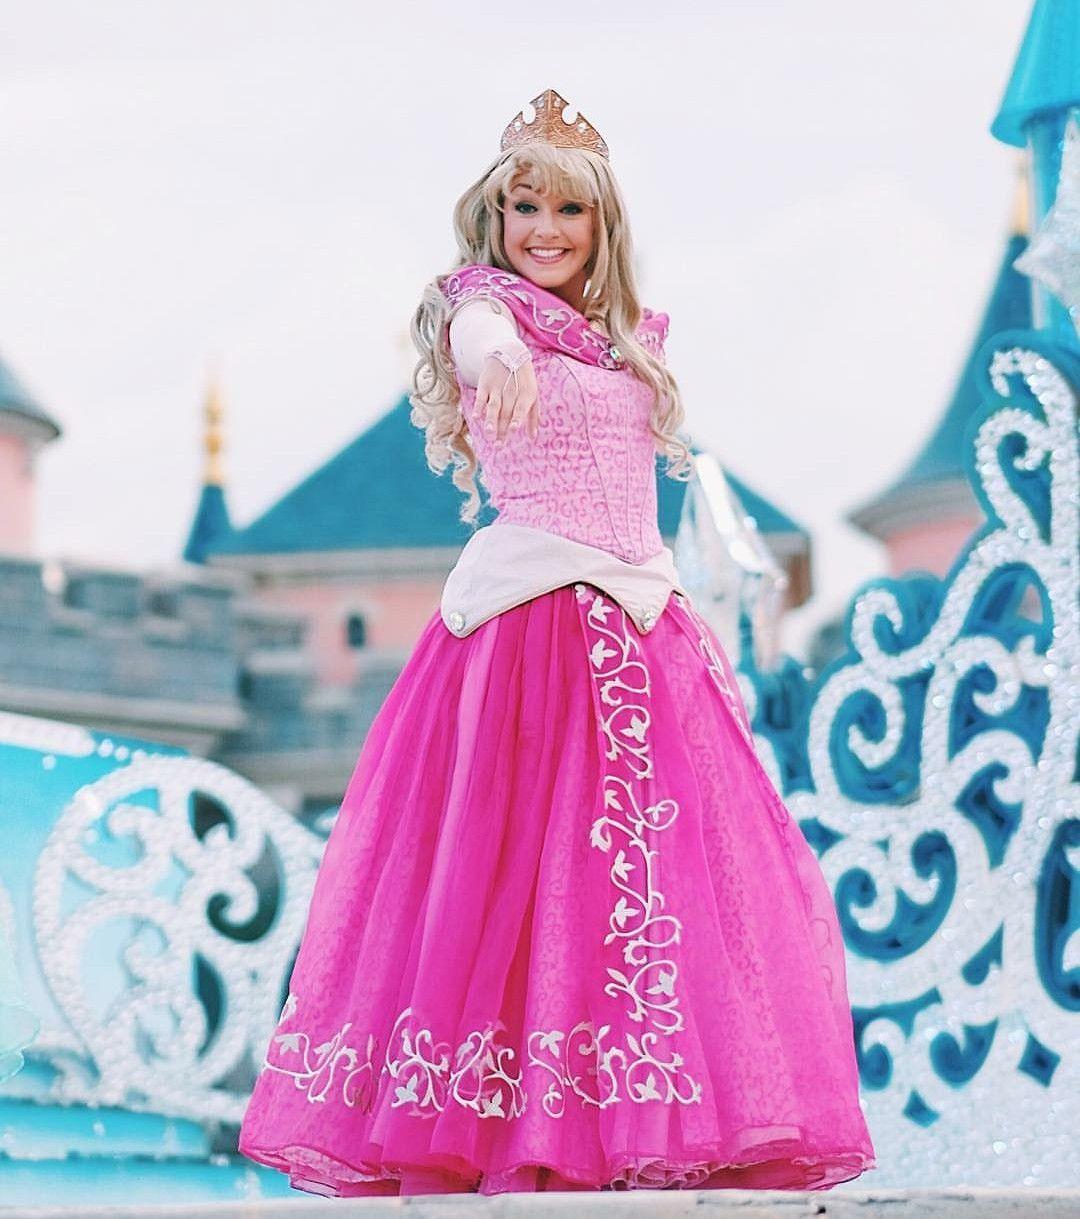 Pin de April Ross en Disney | Pinterest